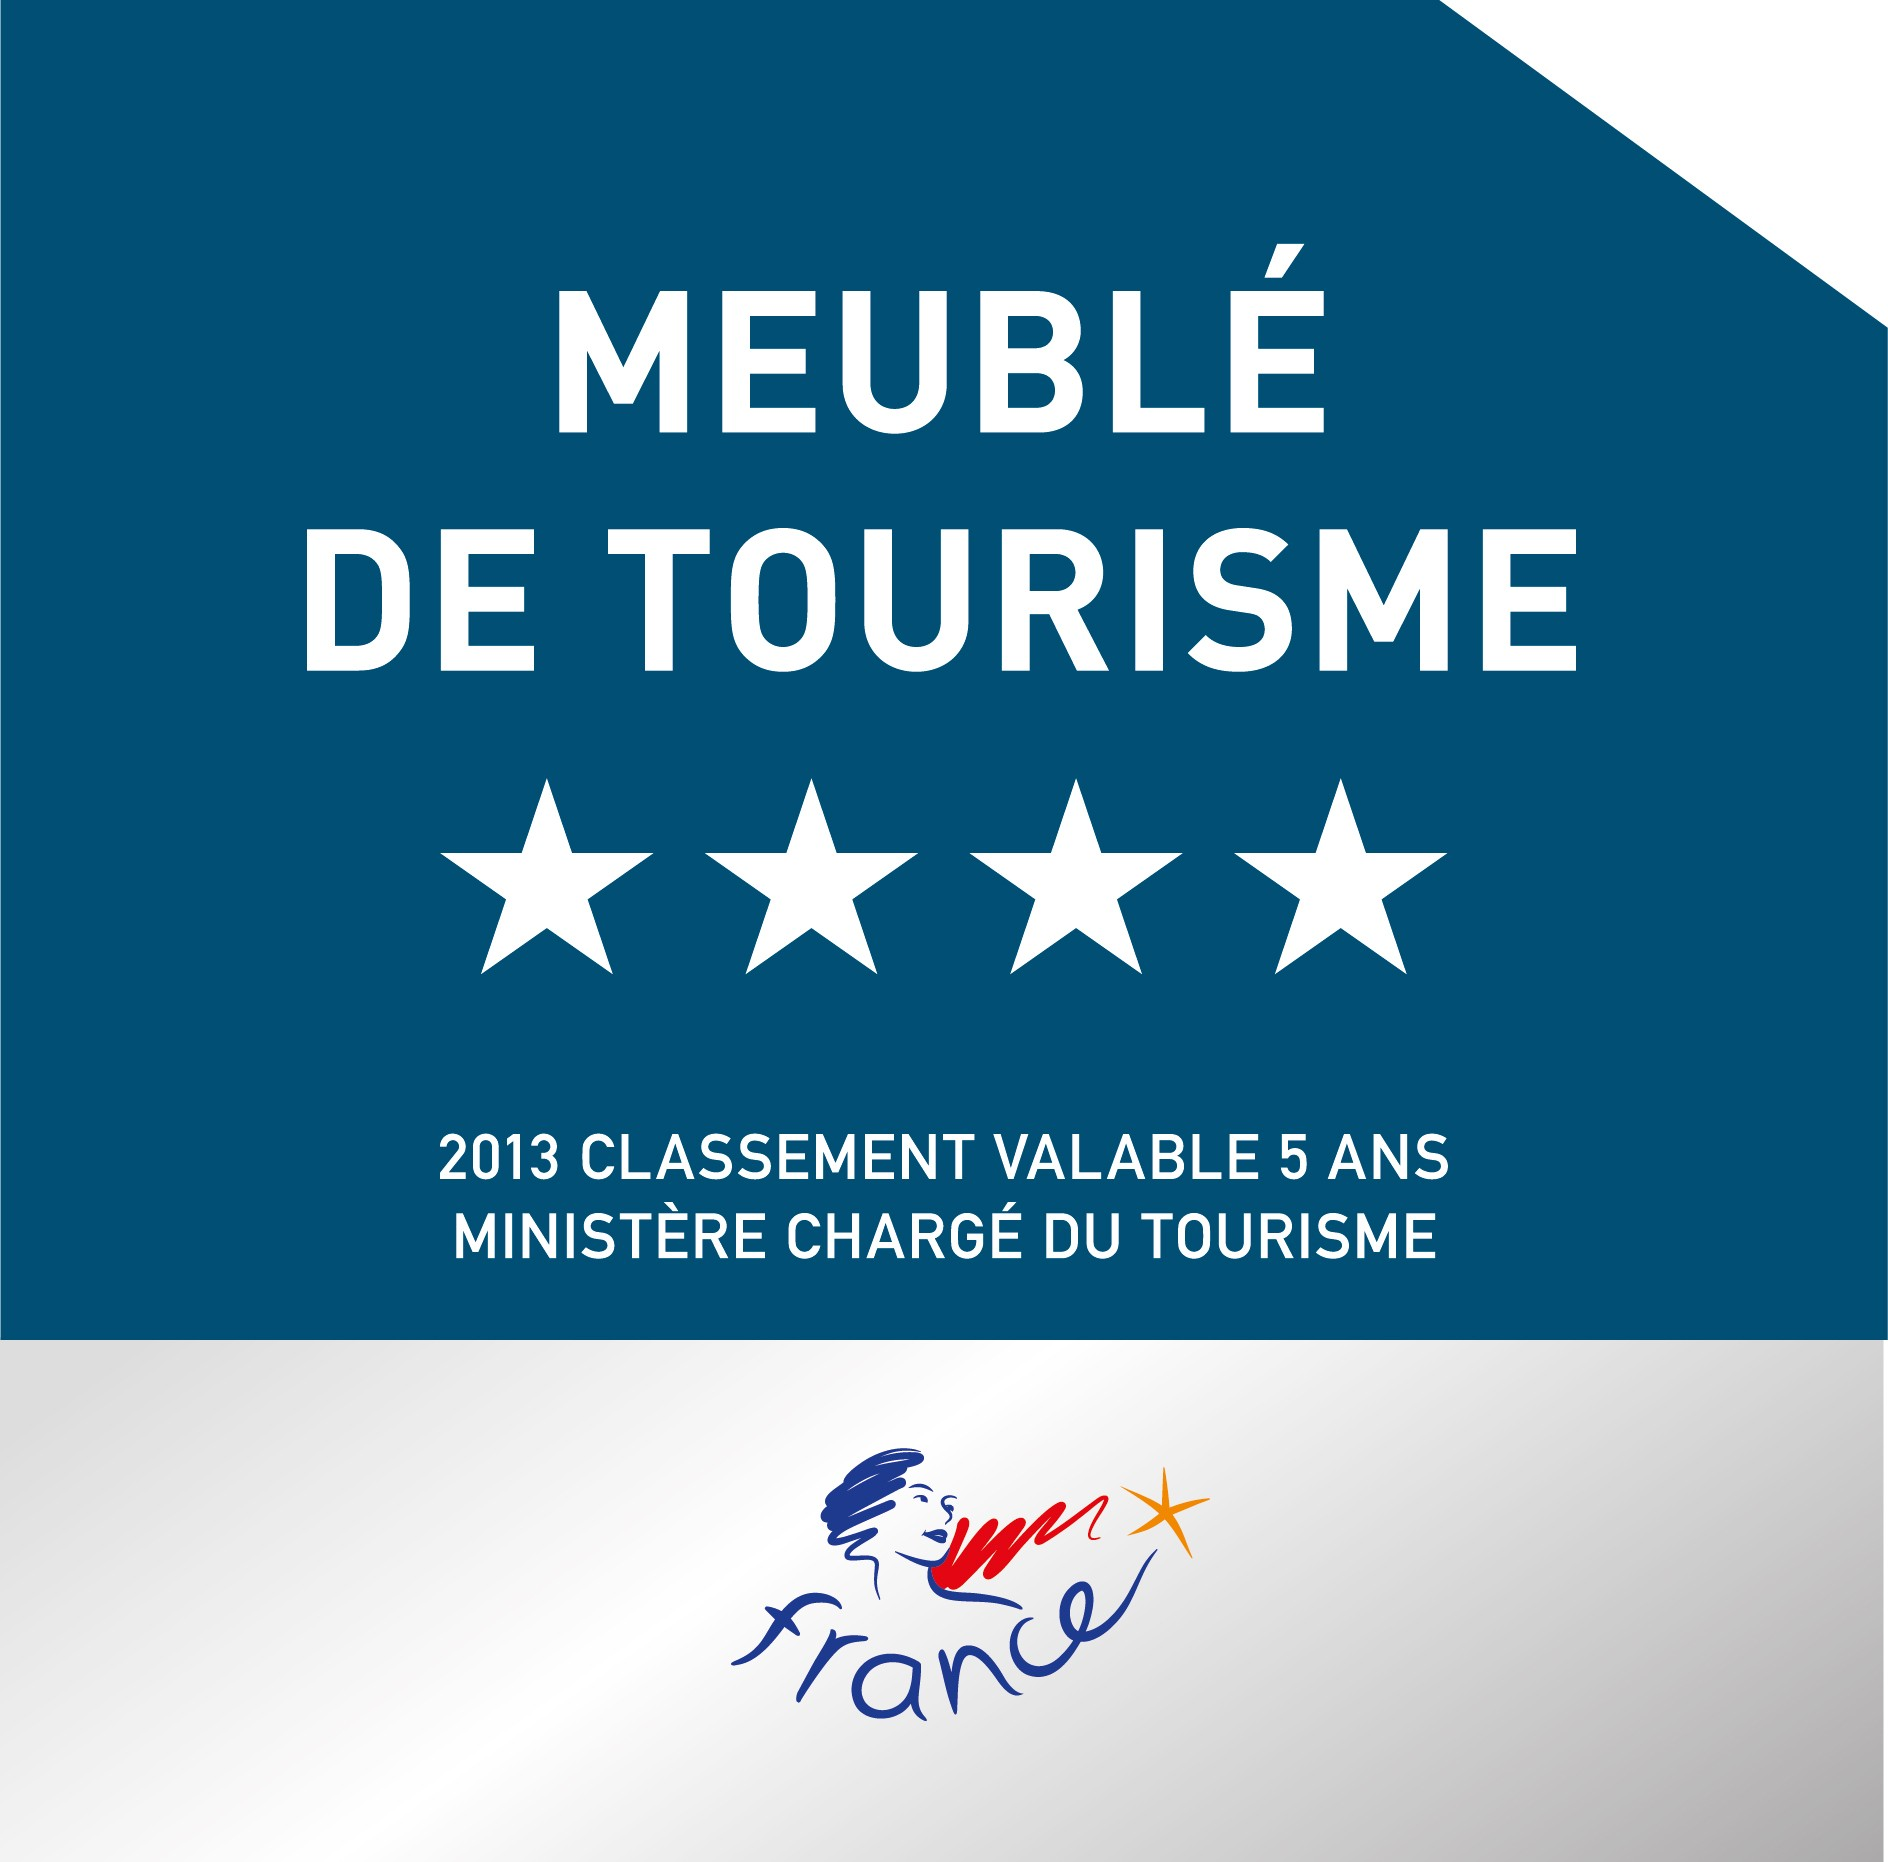 plaque-meuble-tourisme4-13-11625